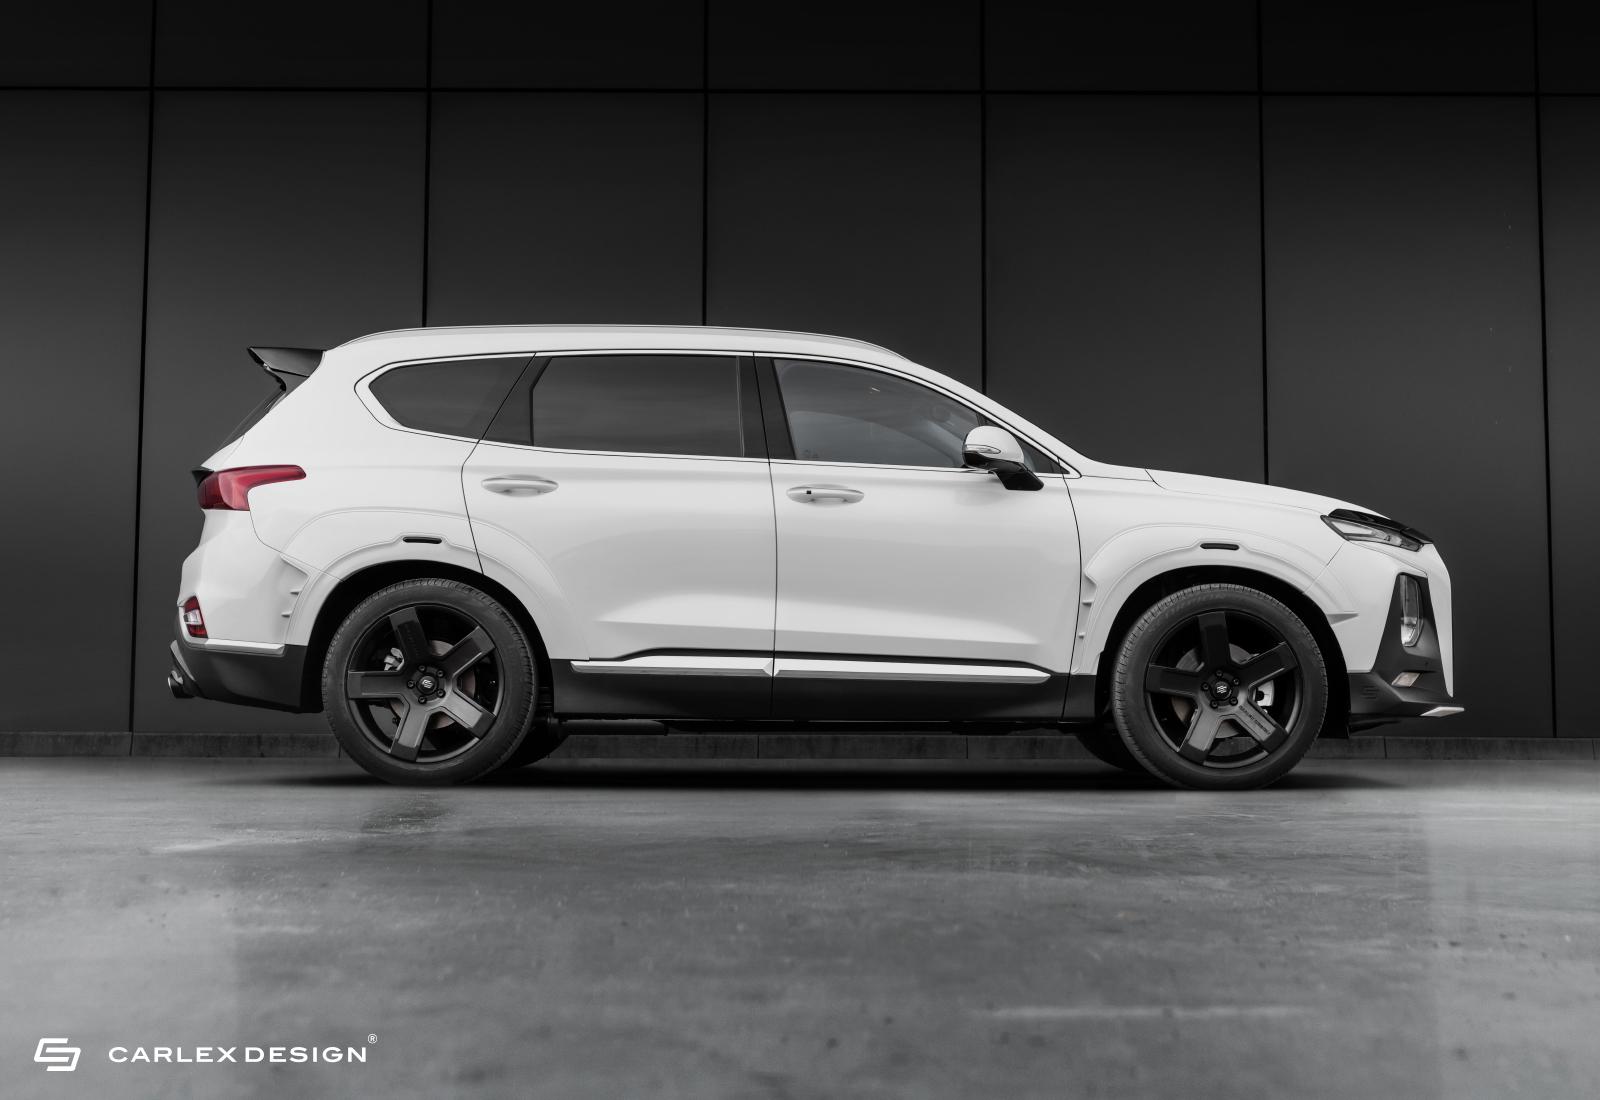 Hyundai-Santa-Fe-by-Carlex-Design-1